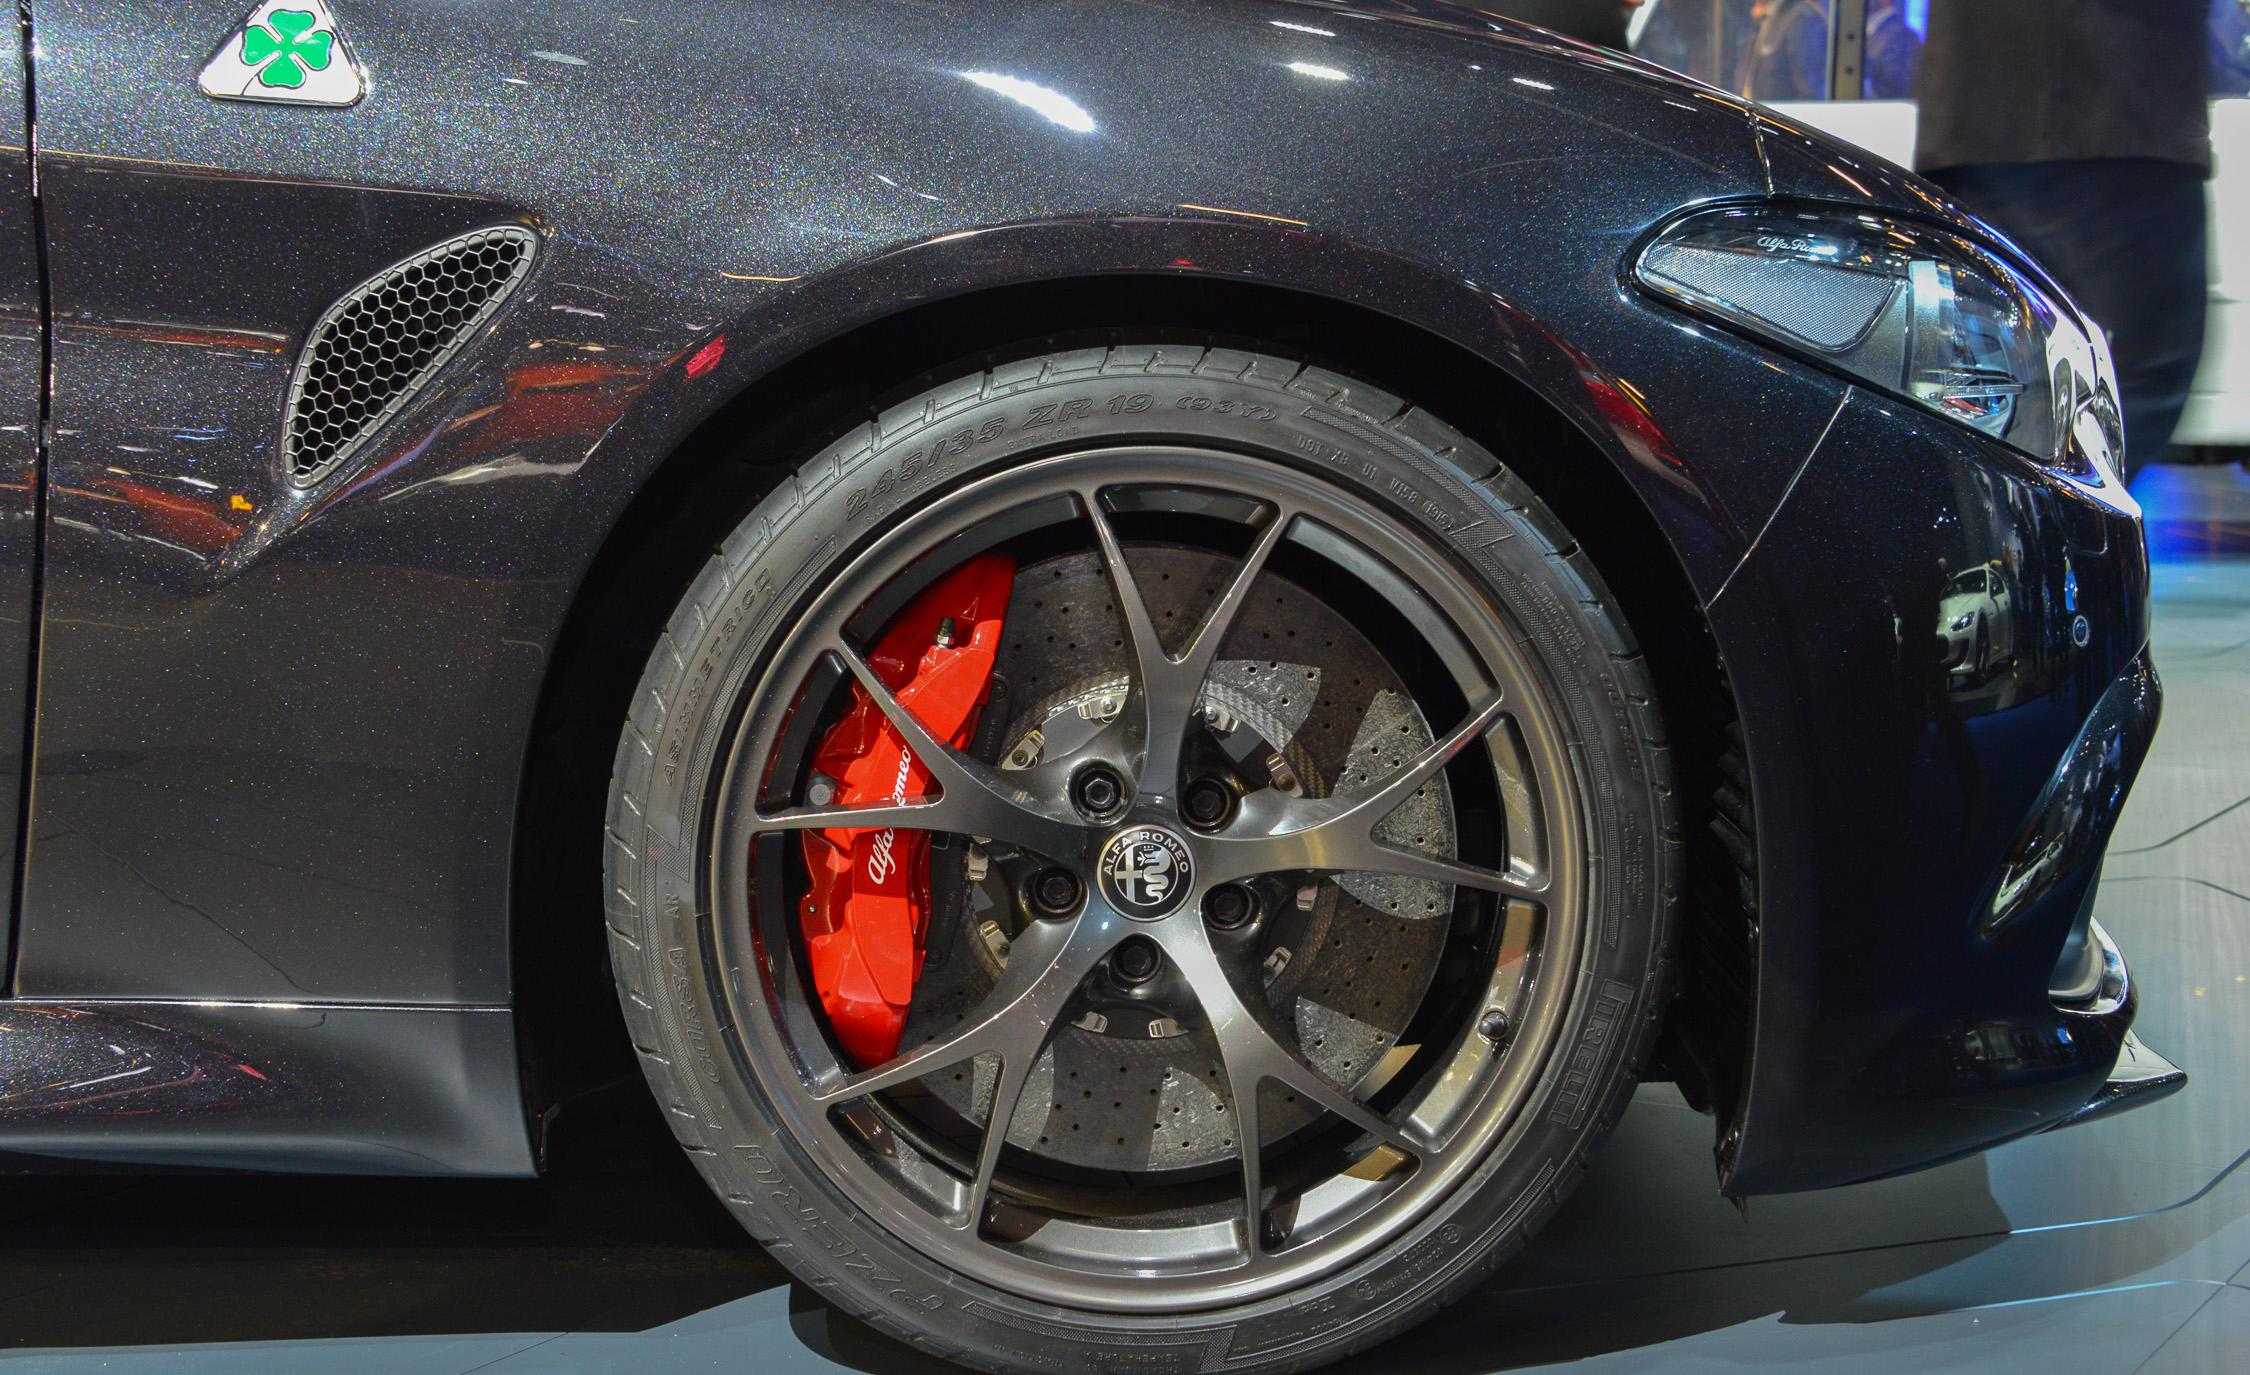 2017 Alfa Romeo Giulia Quadrifoglio Wheel Trim